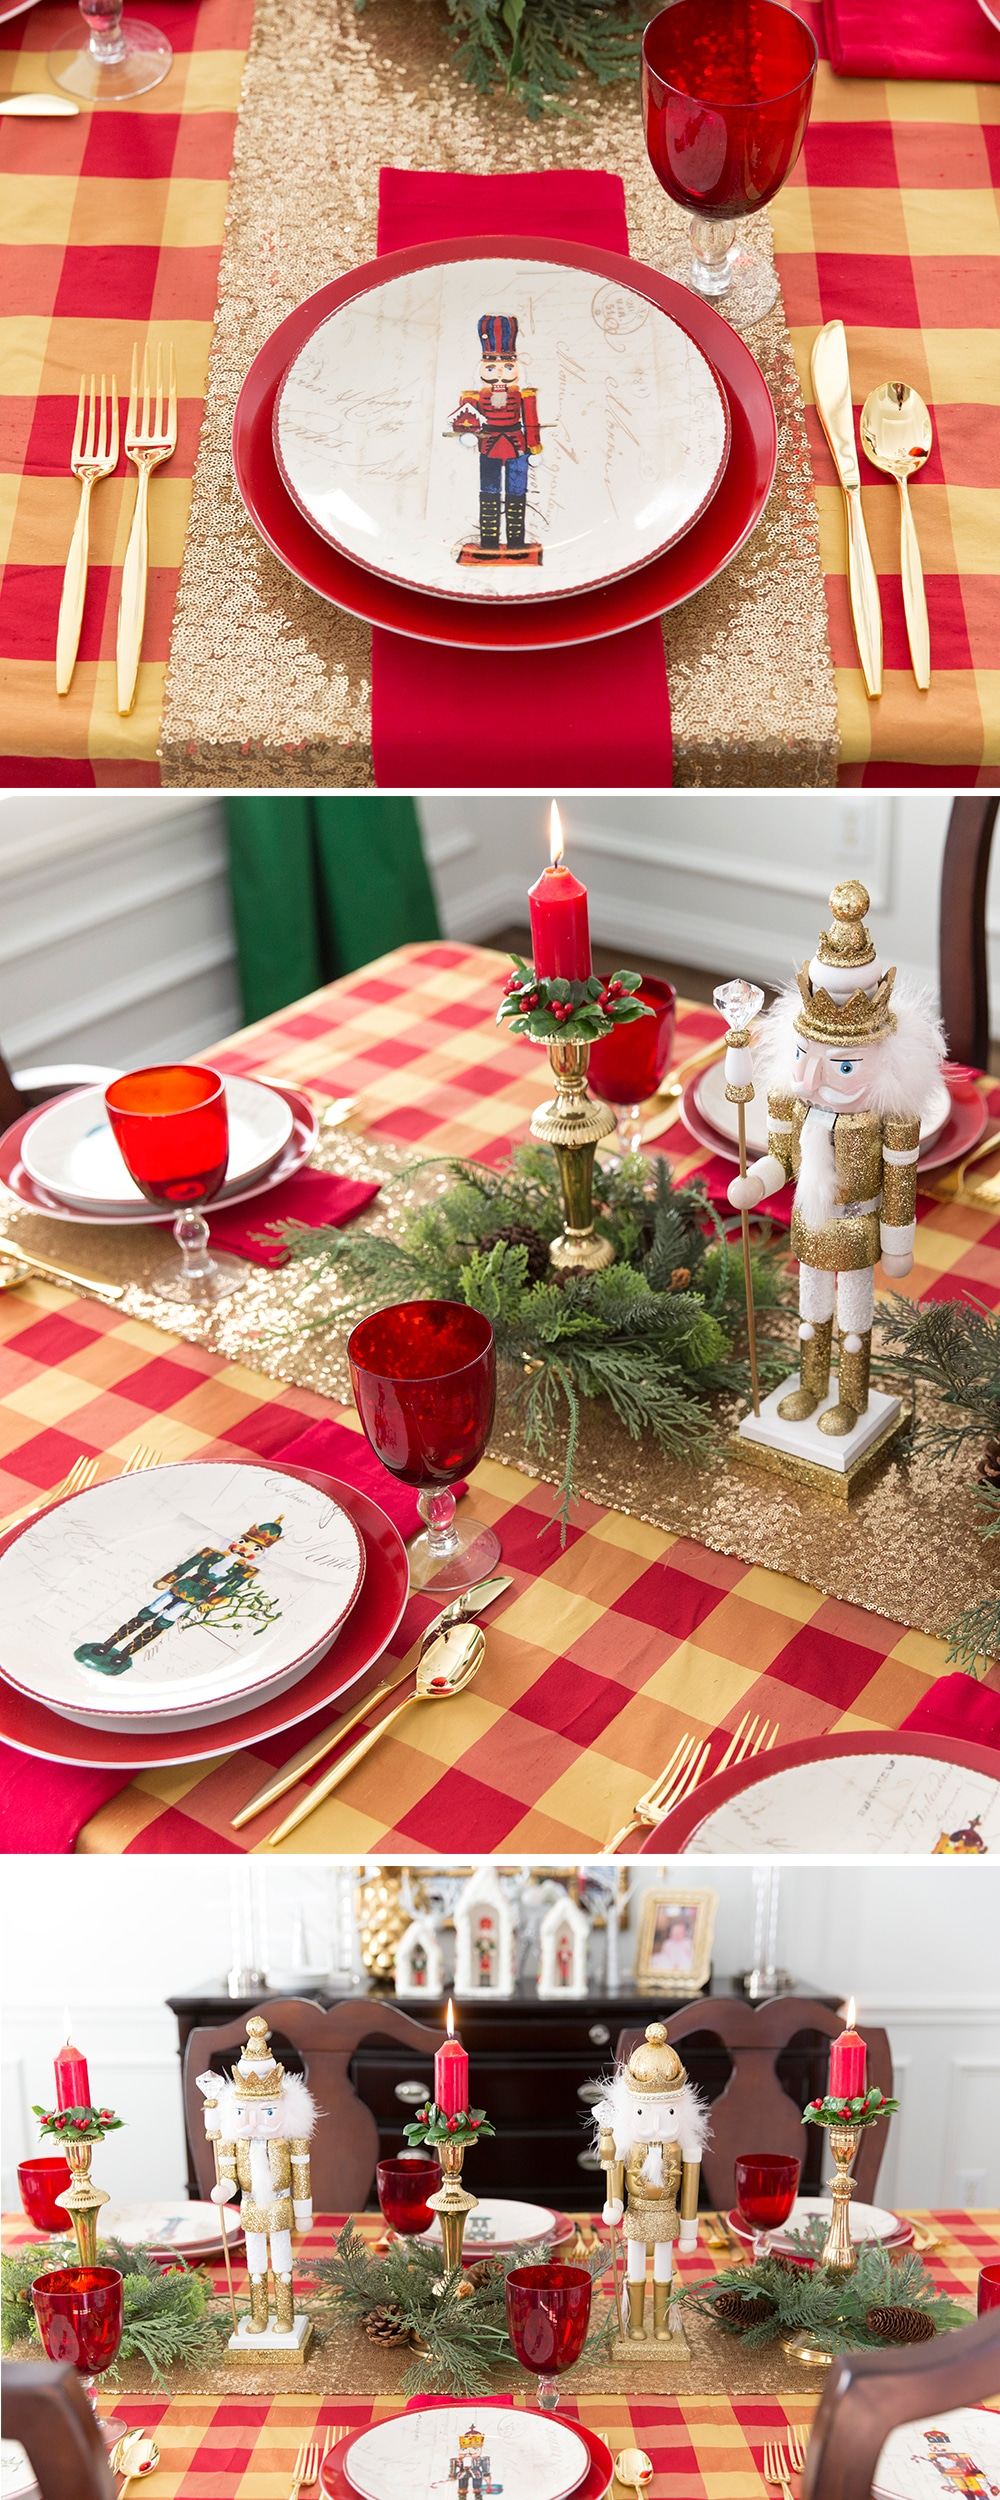 Christmas Nutcracker Party Table!